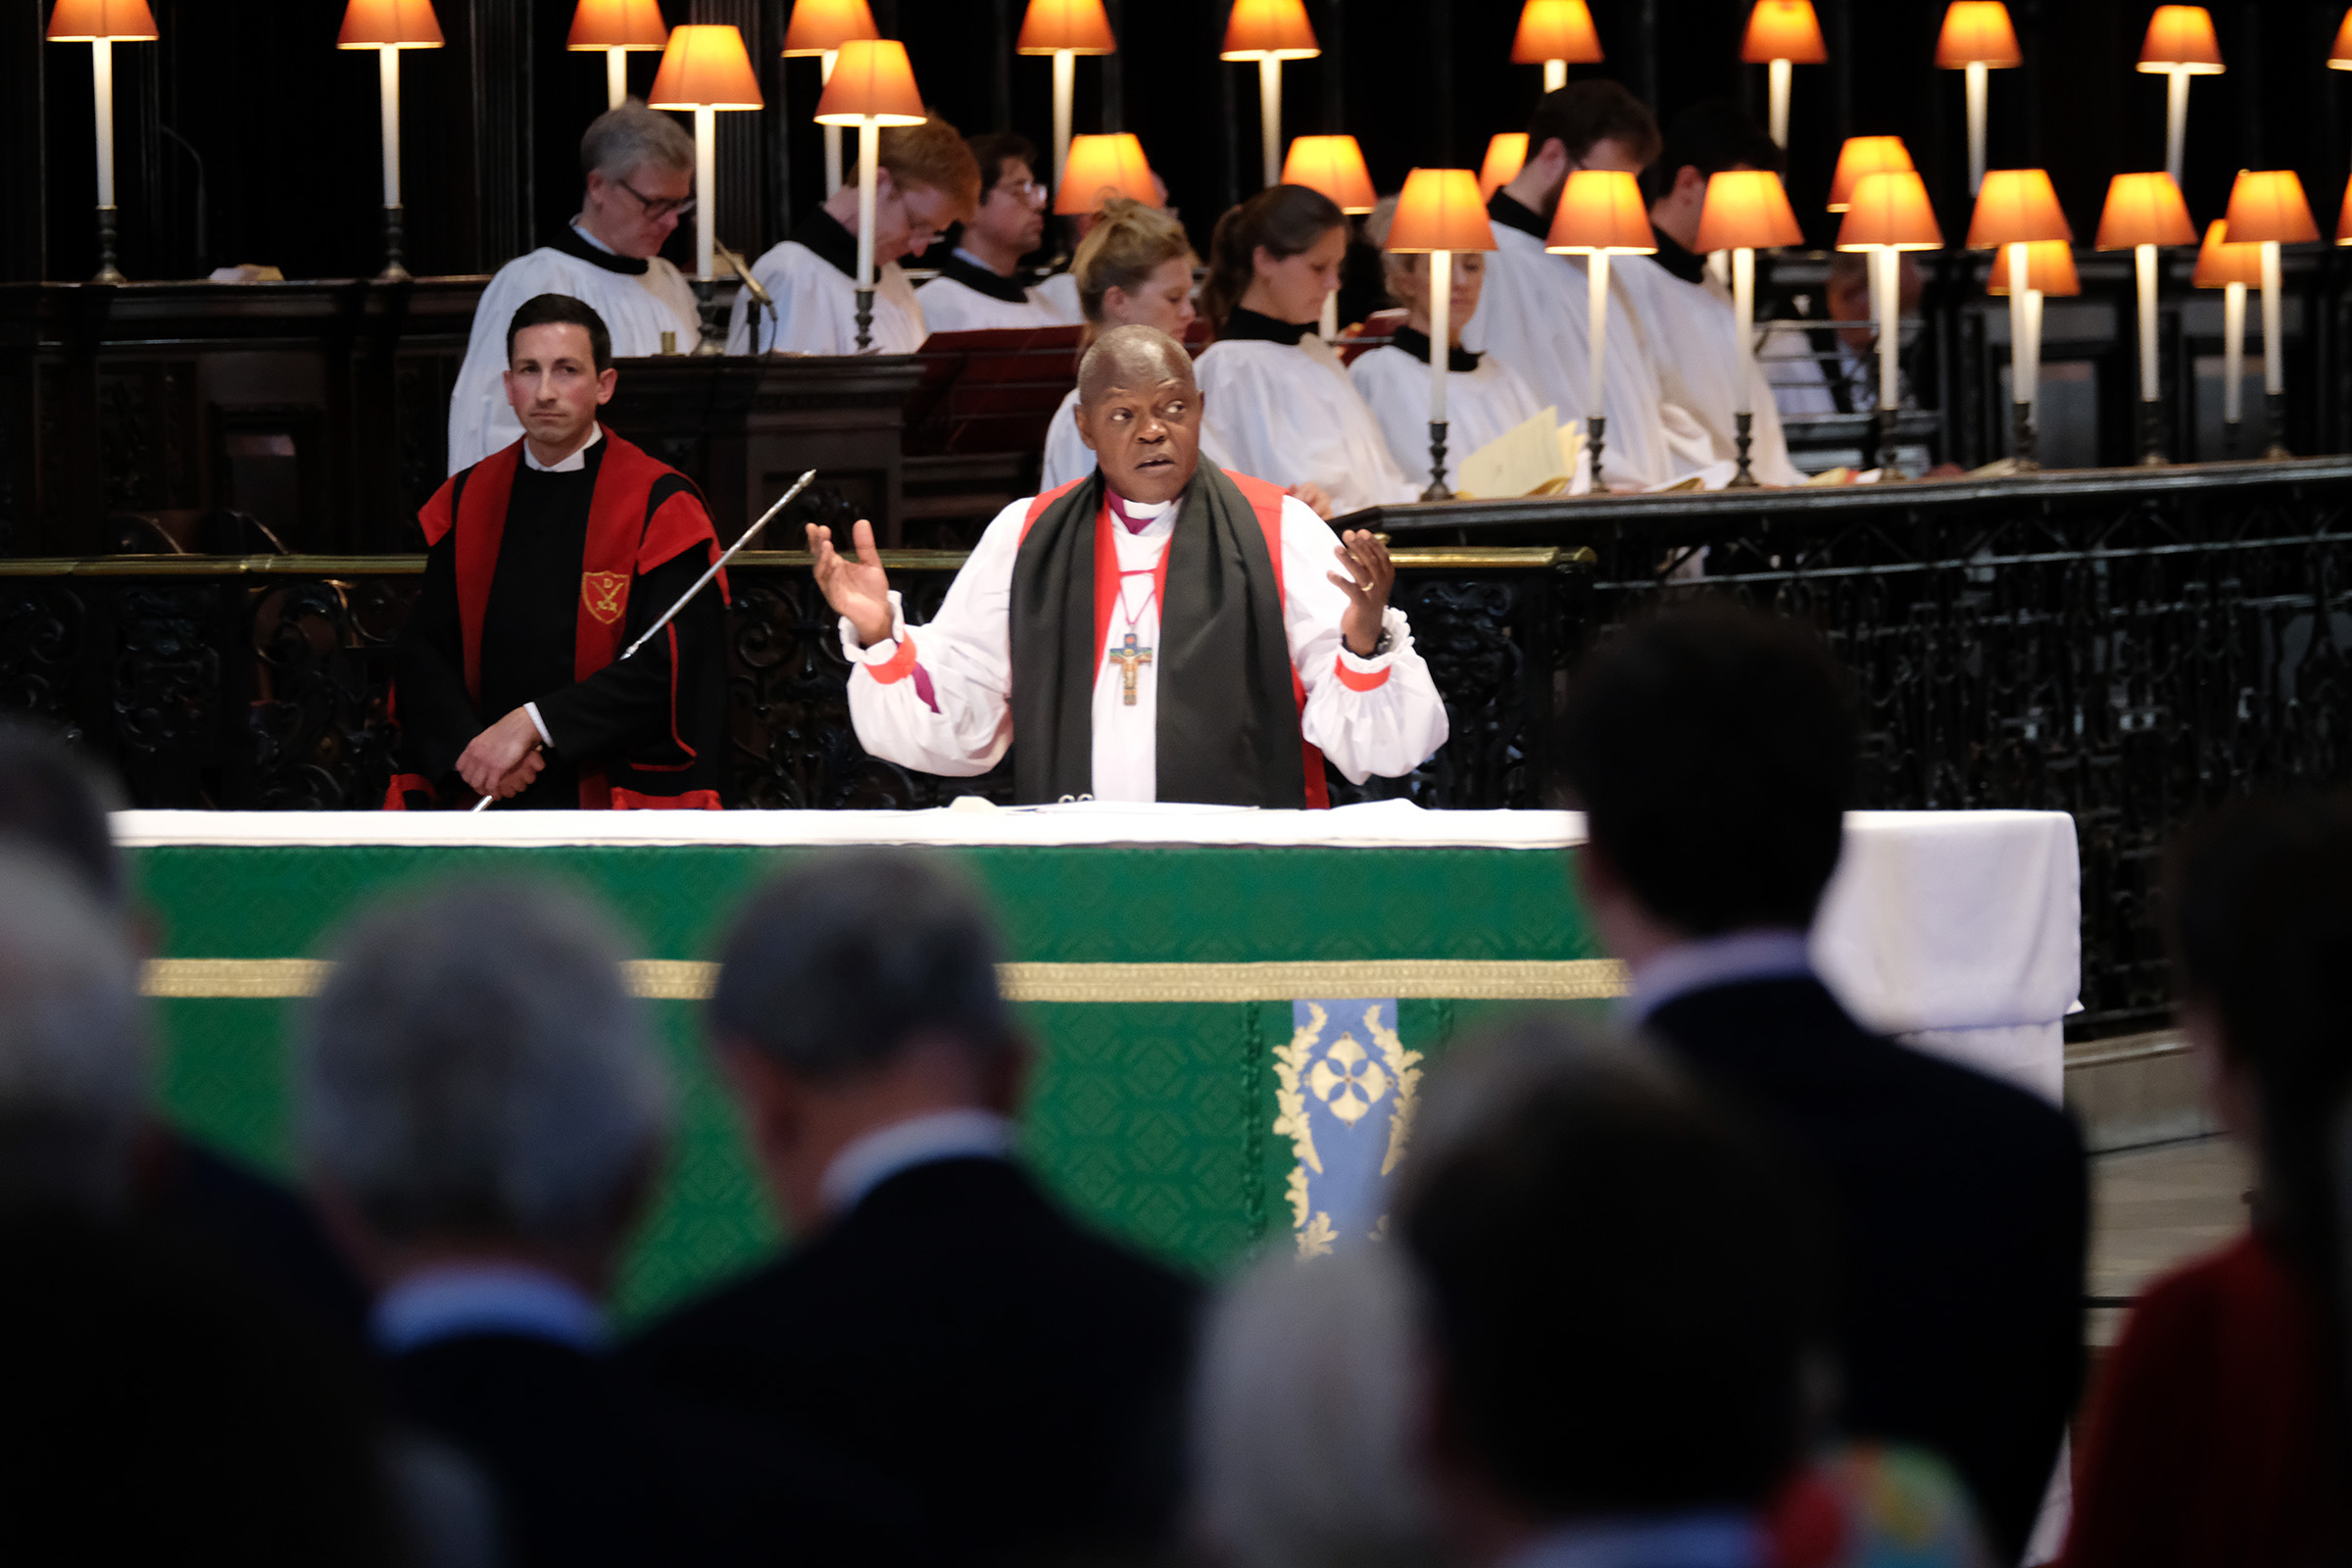 Most Rev and Rt Hon John Sentamu, Archbishop of York